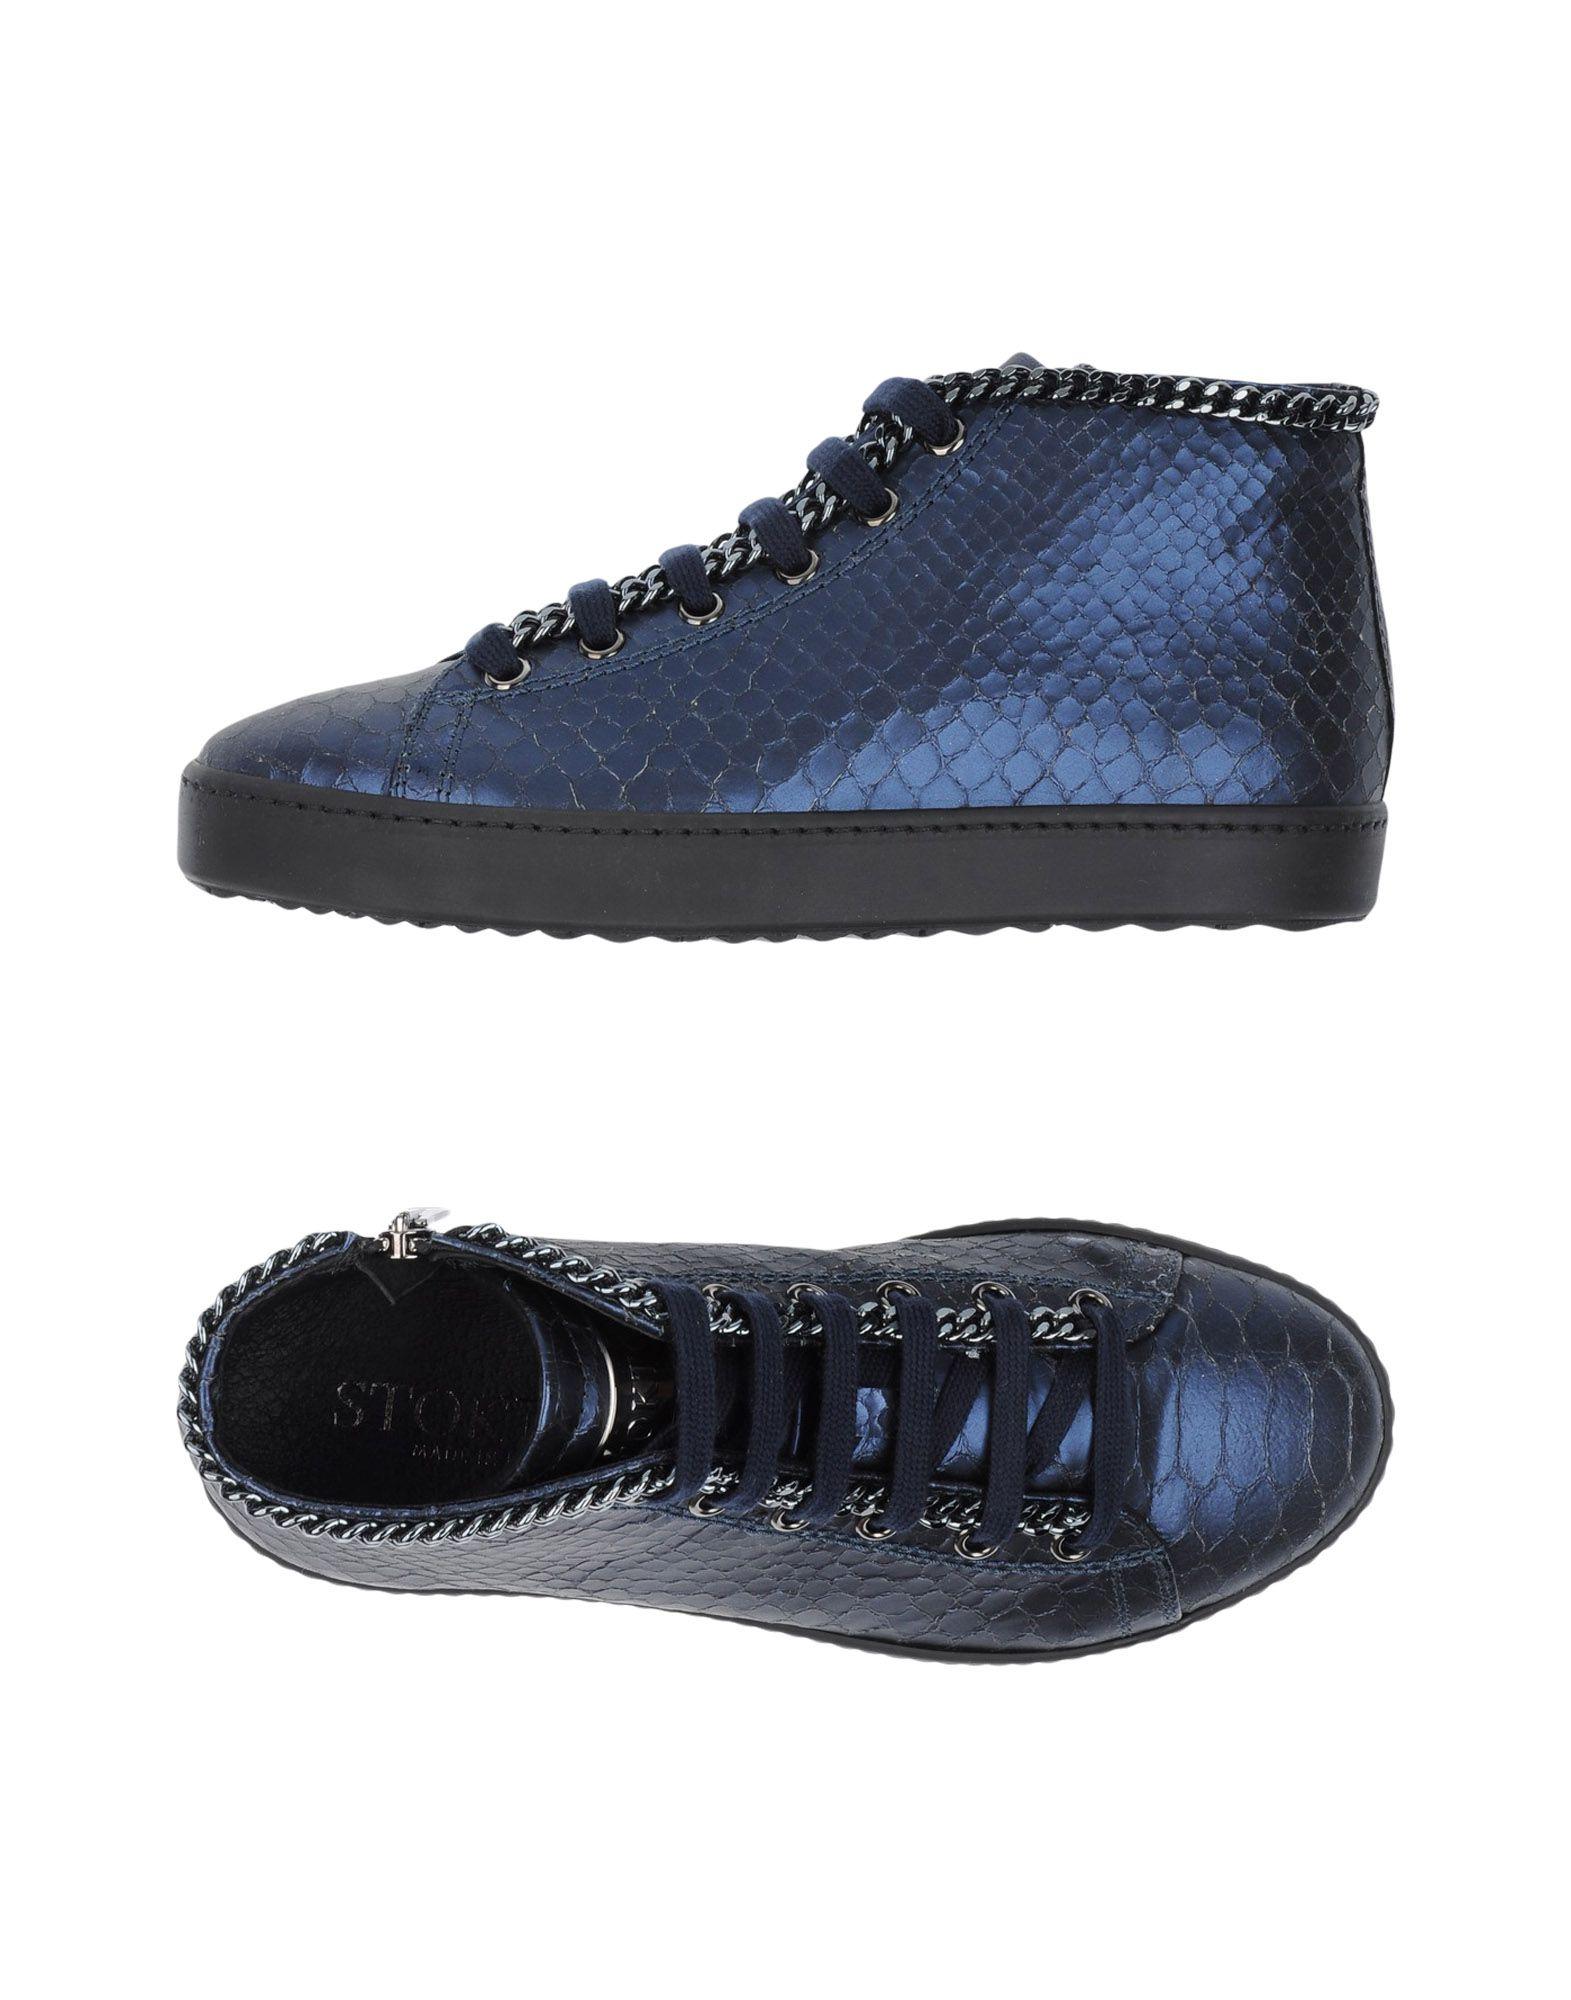 Stokton Sneakers Damen  beliebte 11257657EQ Gute Qualität beliebte  Schuhe 2790ee